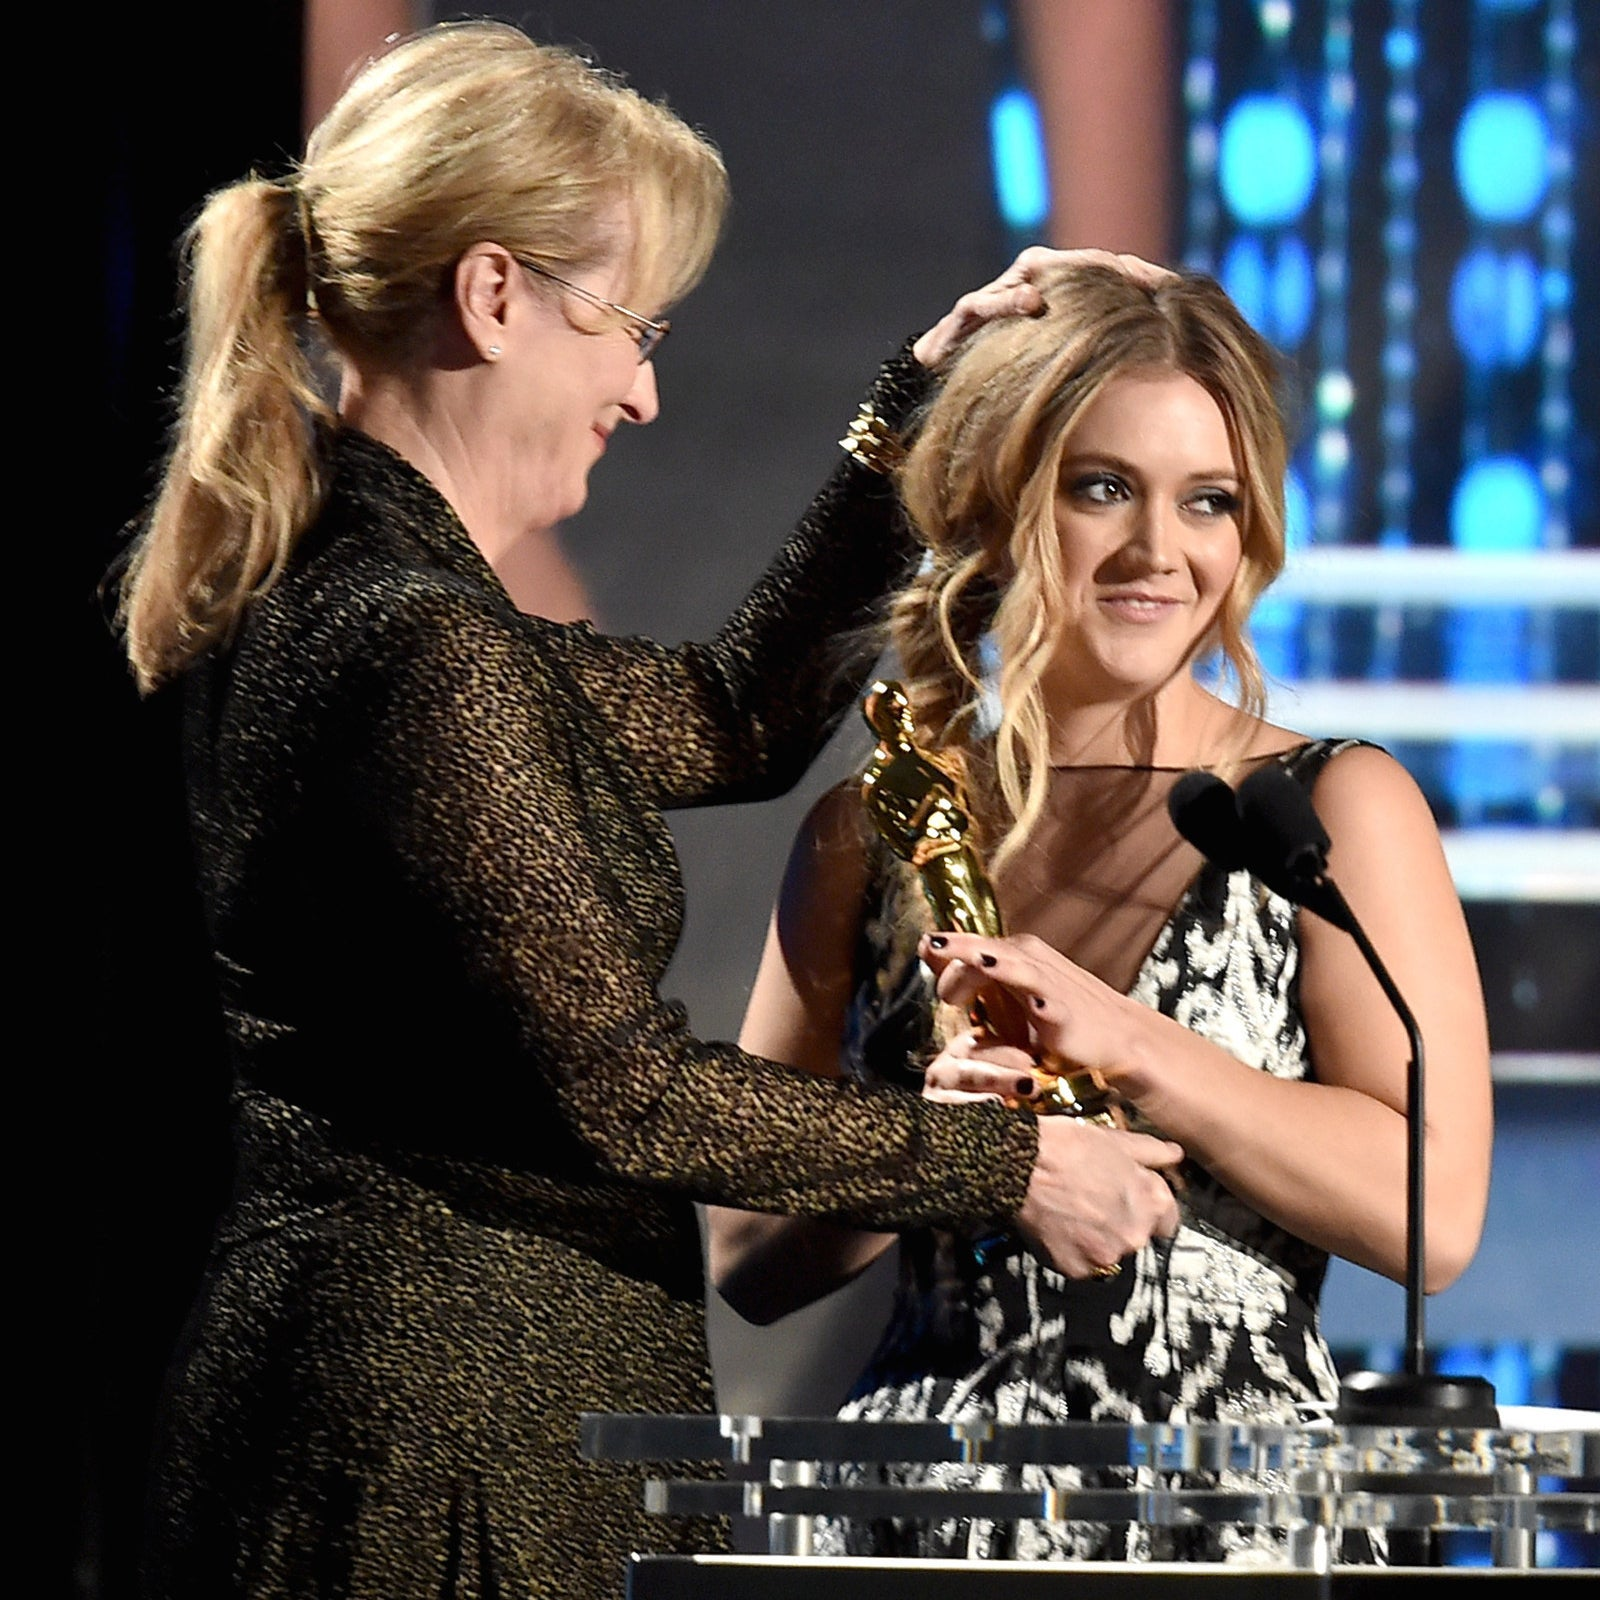 Actor Meryl Streep presents the Jean Hersholt Humanitarian Award to Billie Lourd, on behalf of her grandmother Debbie Reynolds, at the Governors Awards.